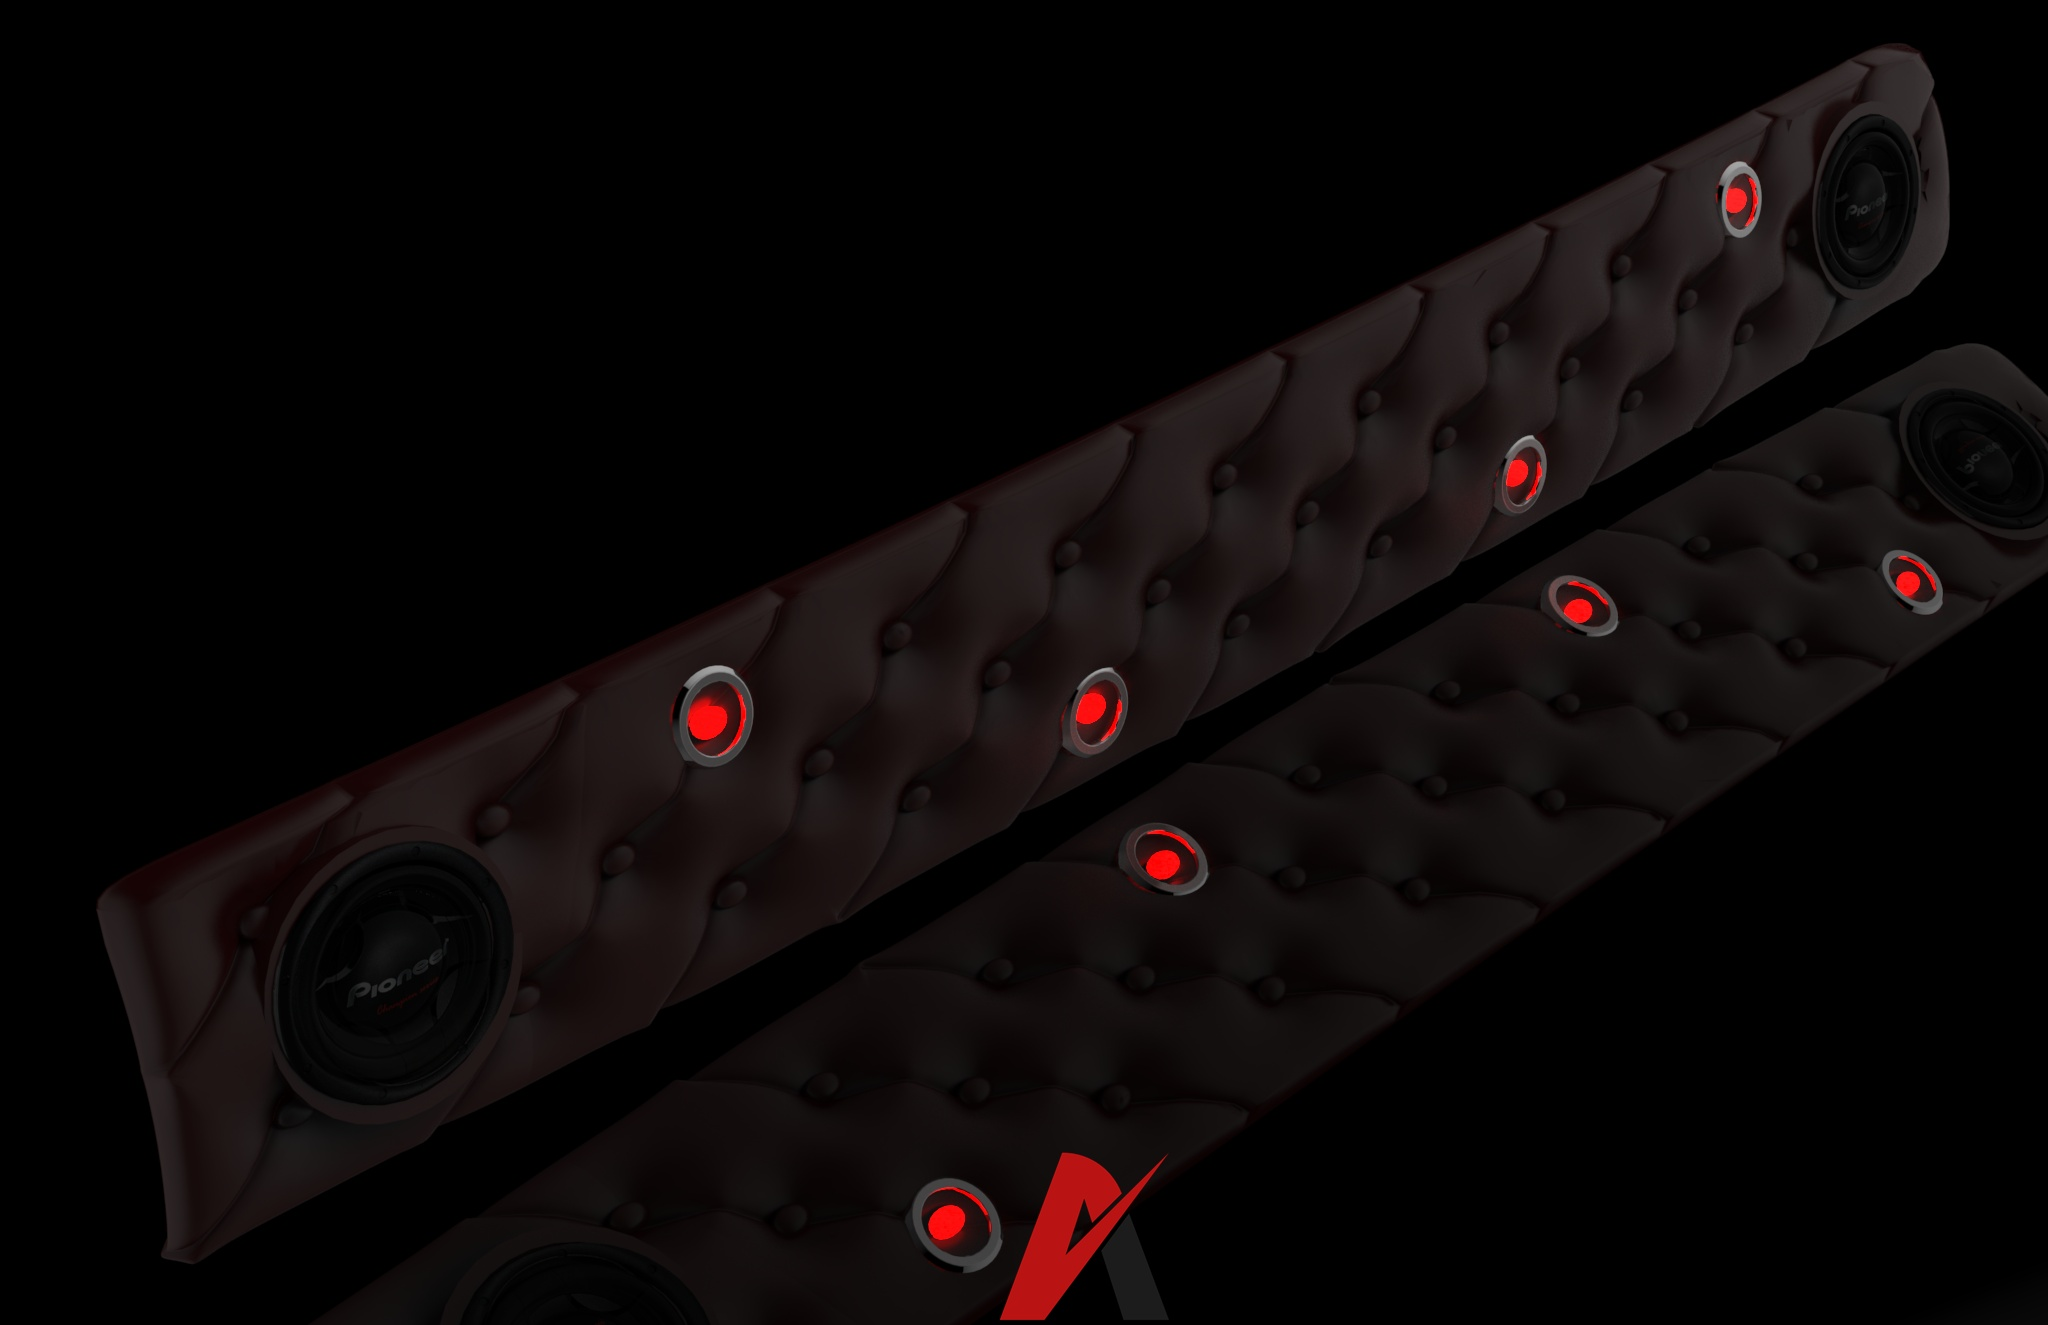 3D Scania Interior Leather Decoration Panel Model